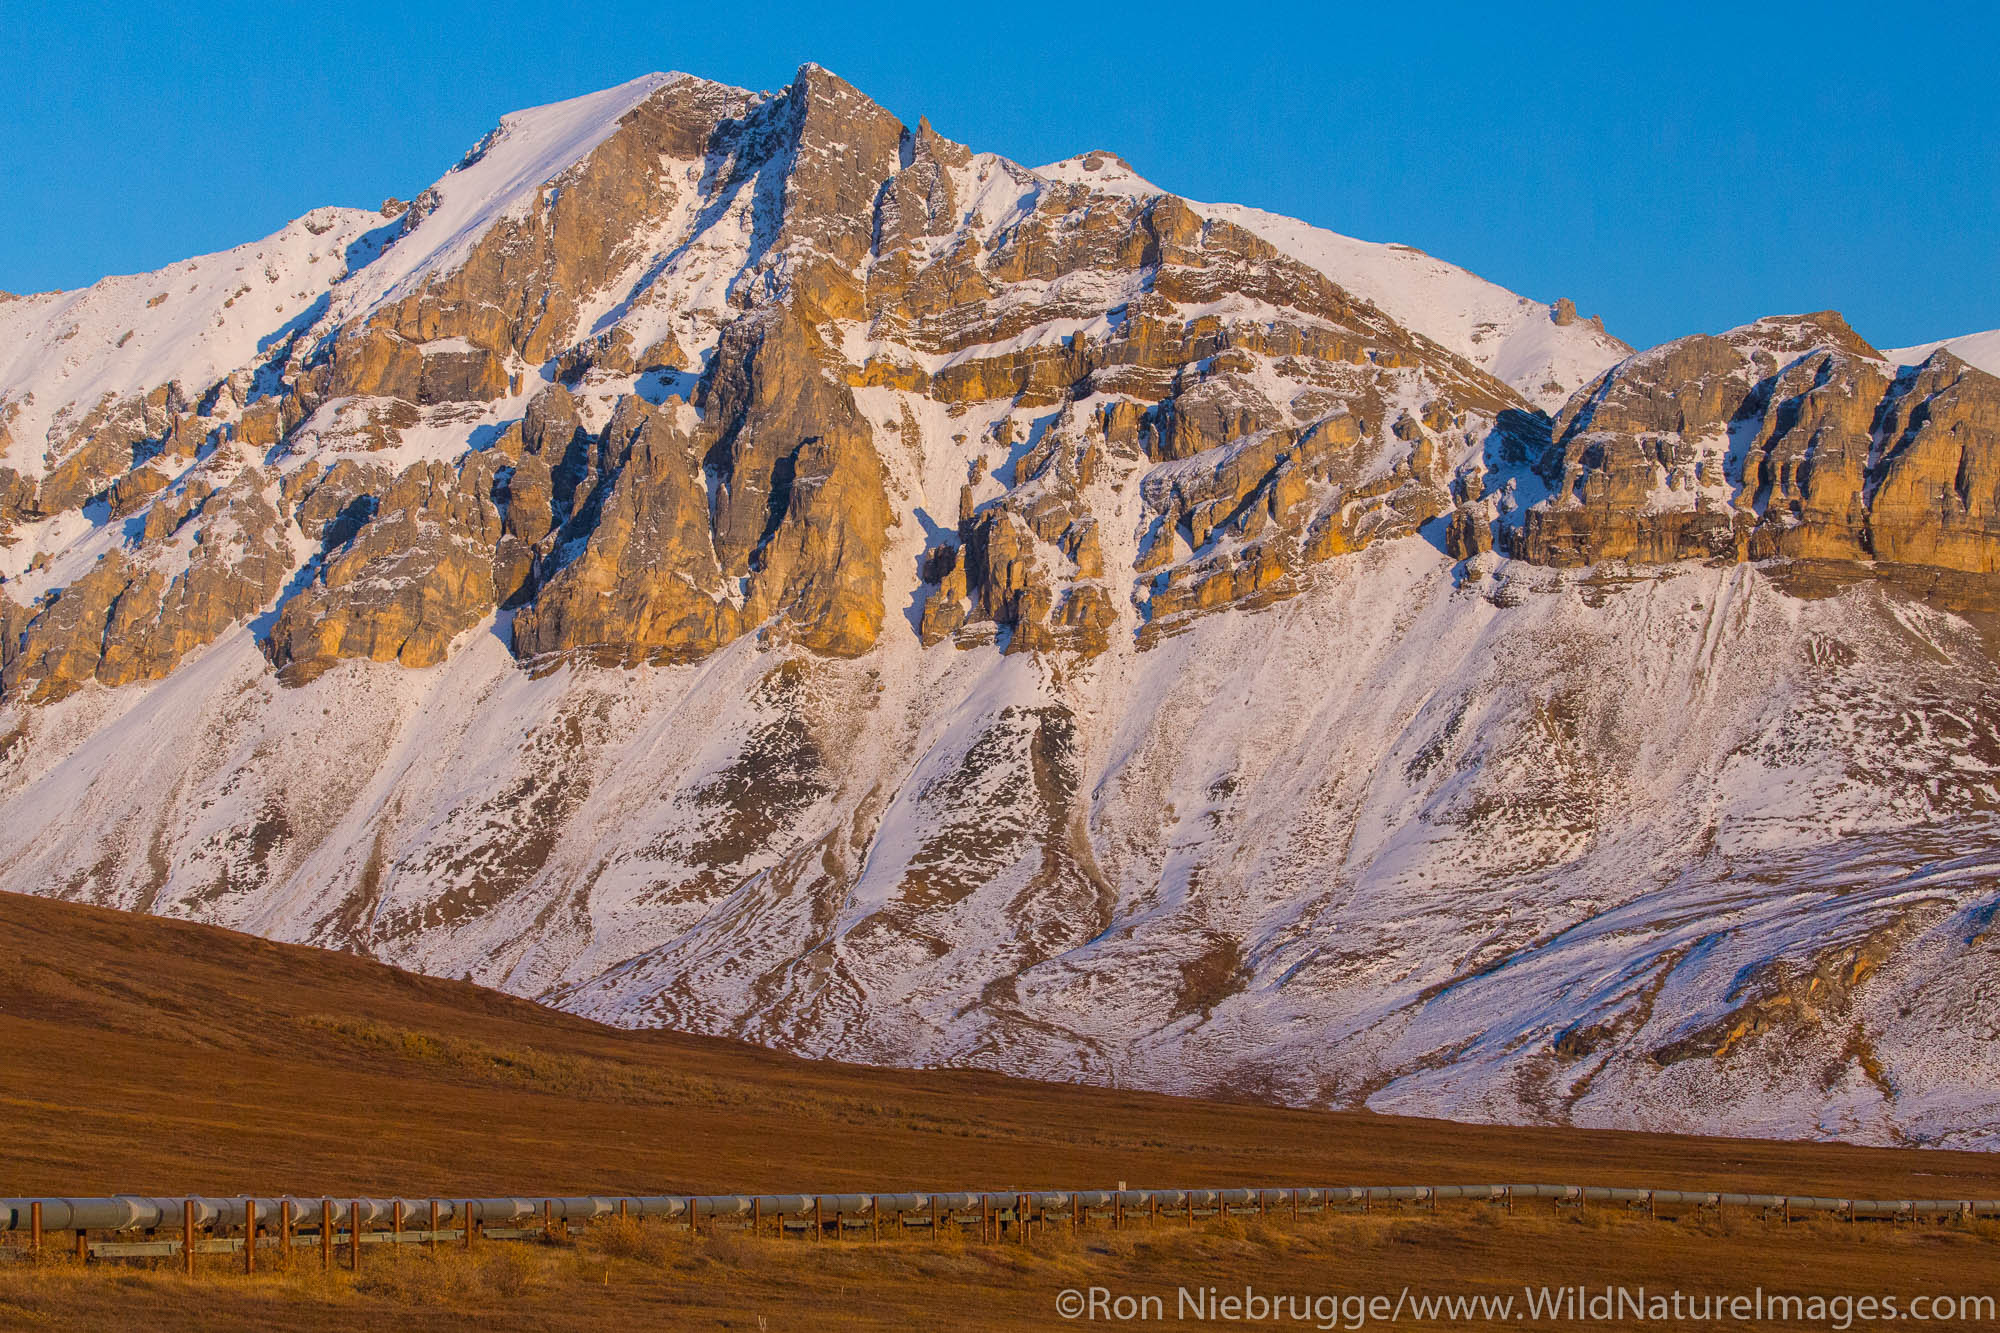 The Brooks Range along the Dalton Highway, Alaska.